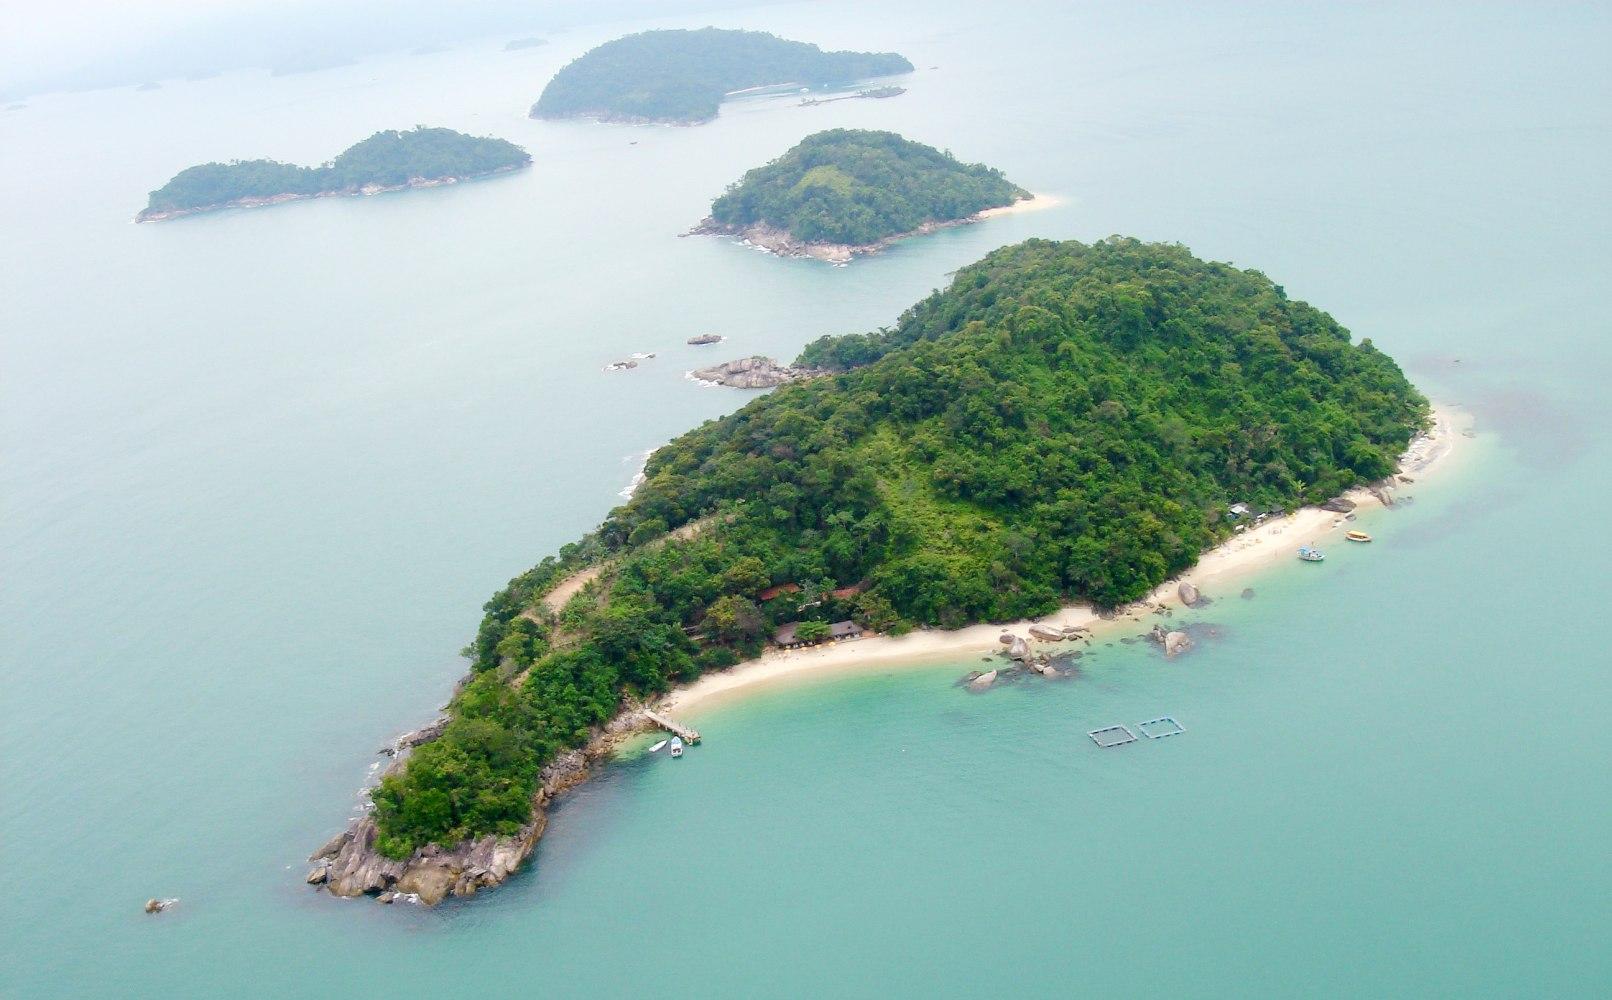 ilha_pelada_grande_003